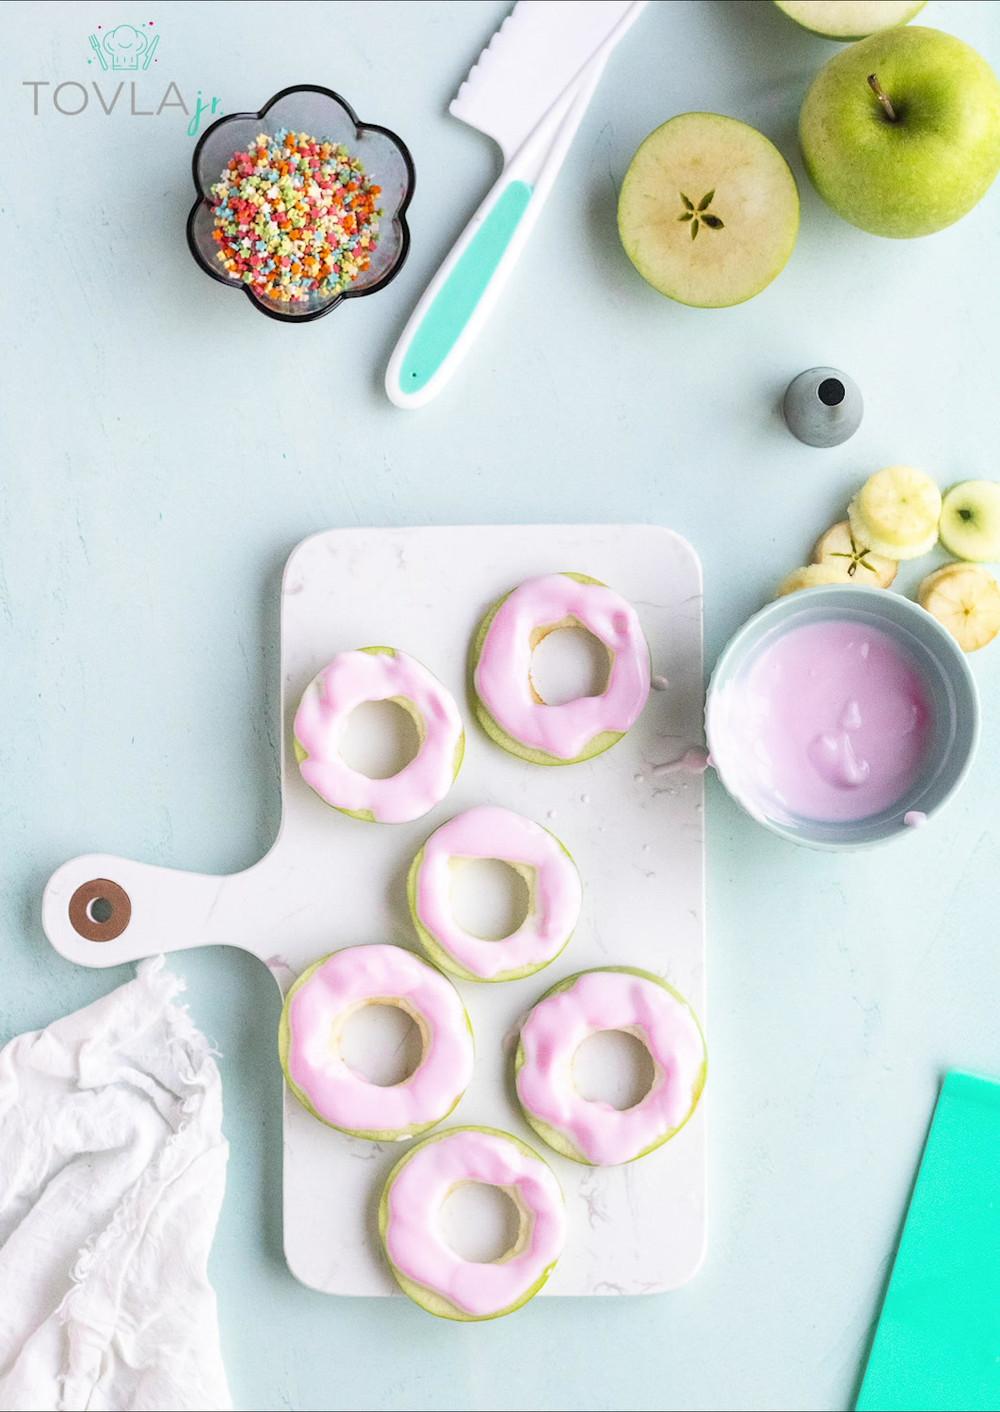 Apple Donuts for Tovla Jr.